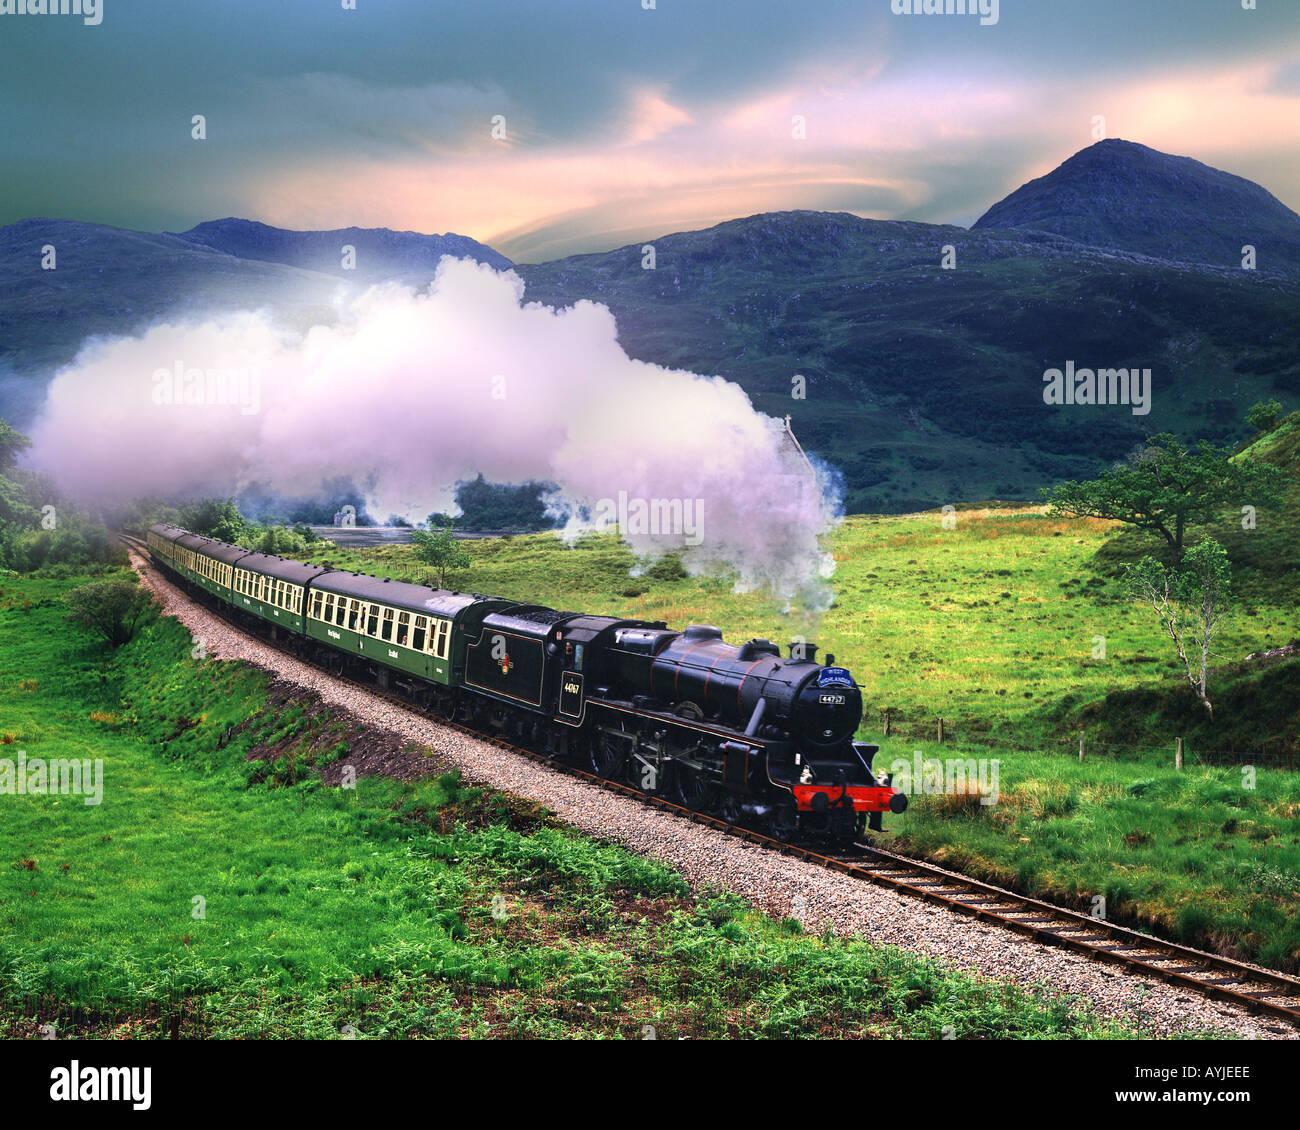 GB - SCOTLAND: 'The Jacobite' Steam Train - Stock Image